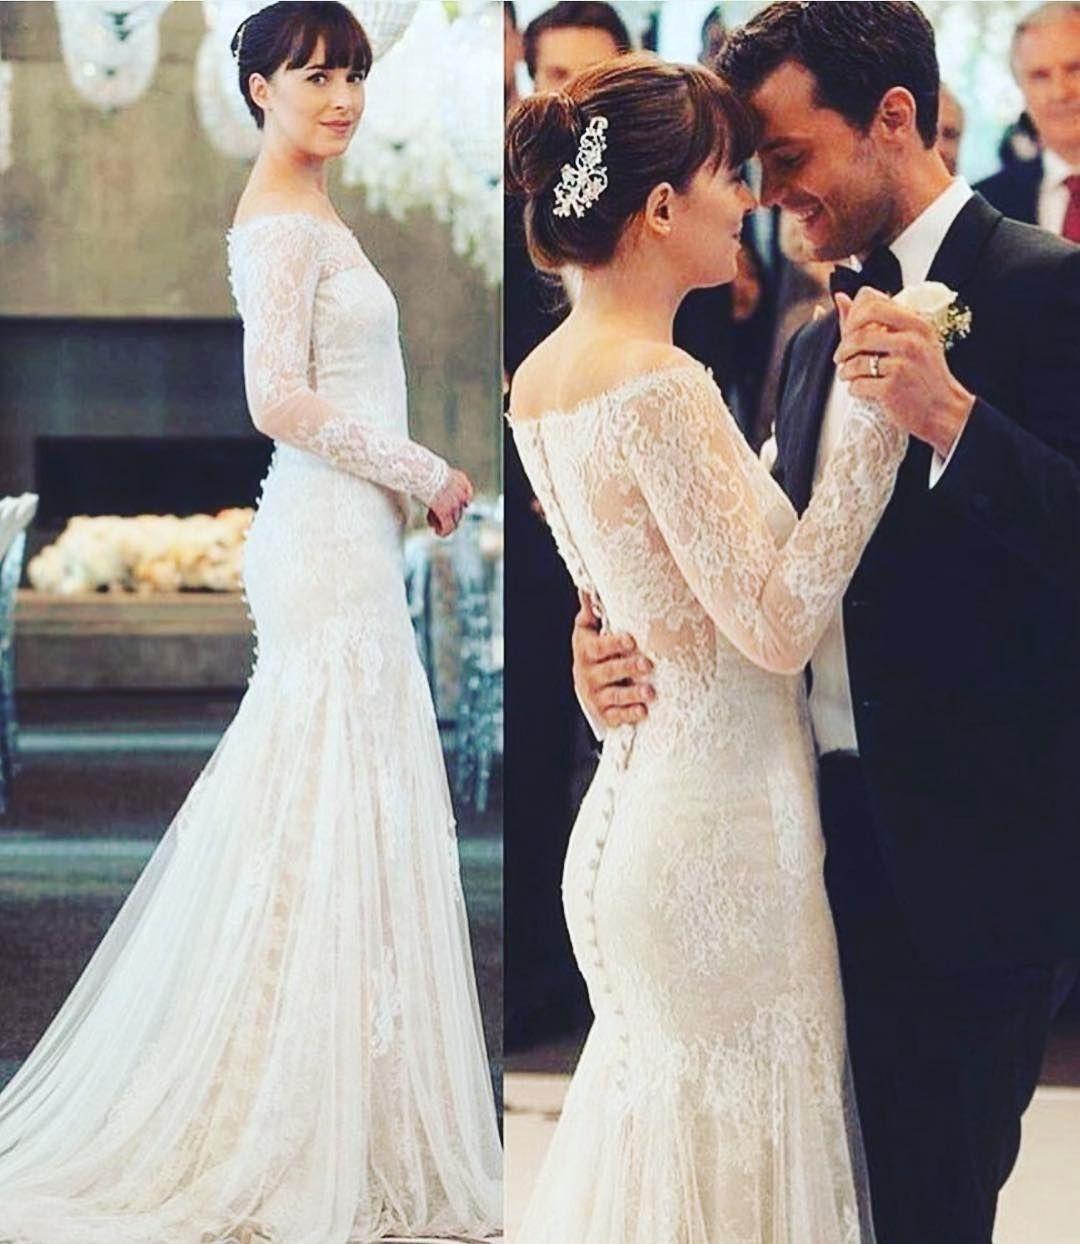 6 Likes 1 Comments Wedding Dress Weddressplus On Instagram Anyone See Fifty Shades Grey Wedding Dress Lace Mermaid Wedding Dress Mermaid Wedding Dress [ 1244 x 1080 Pixel ]